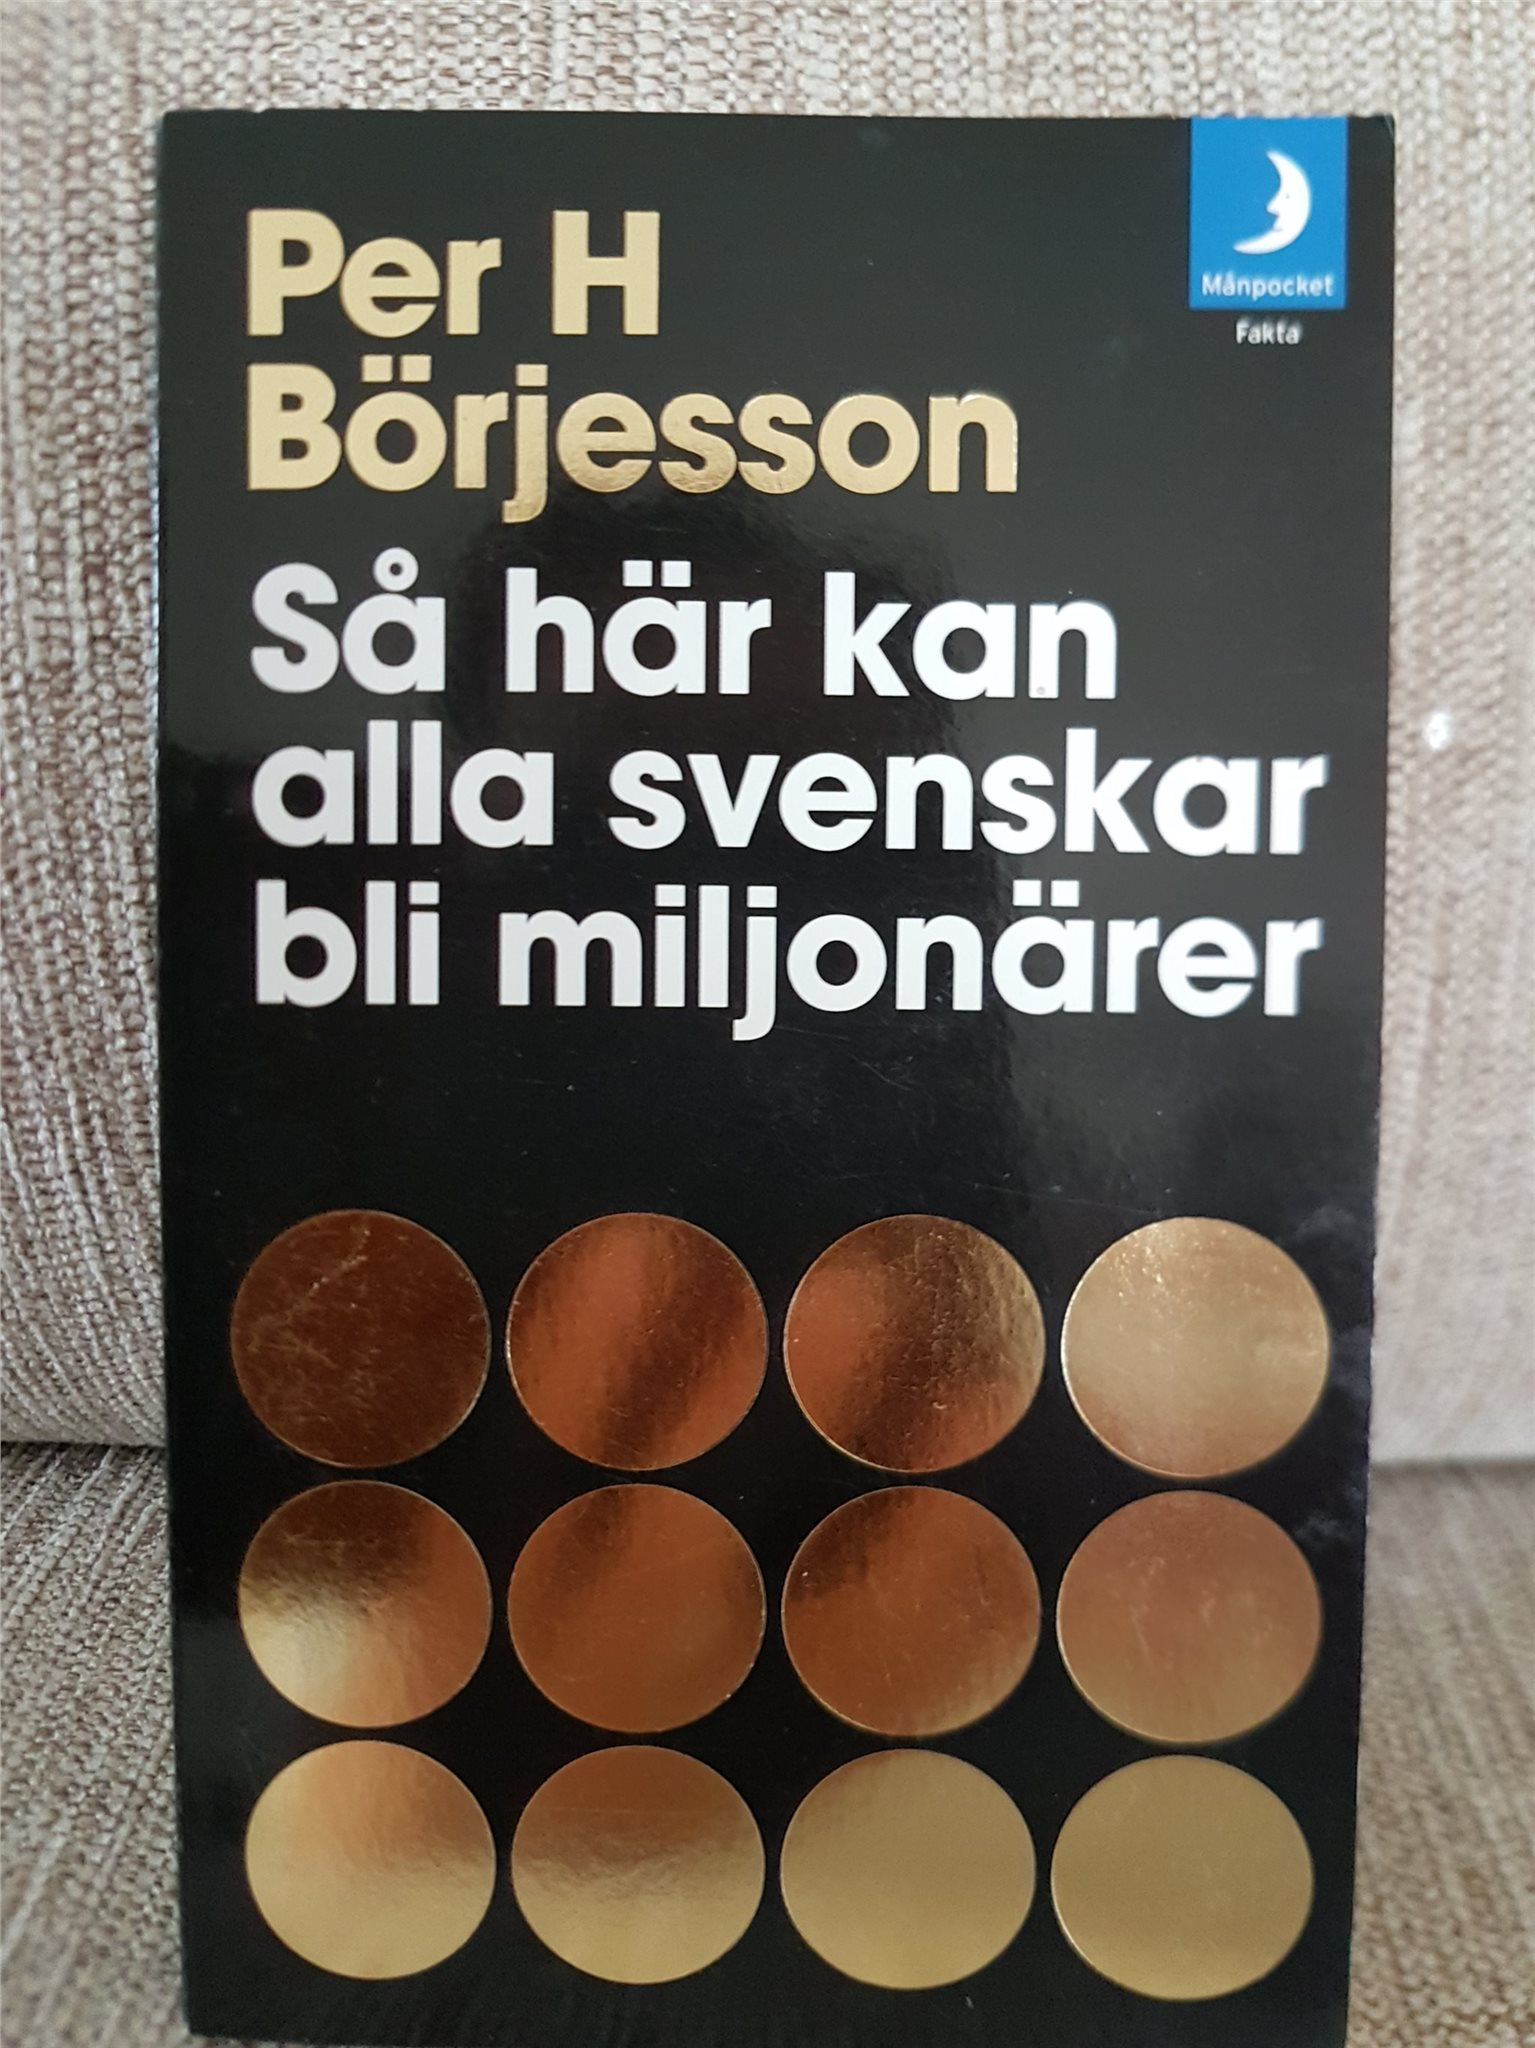 De svenska miljonarerna blir allt fler